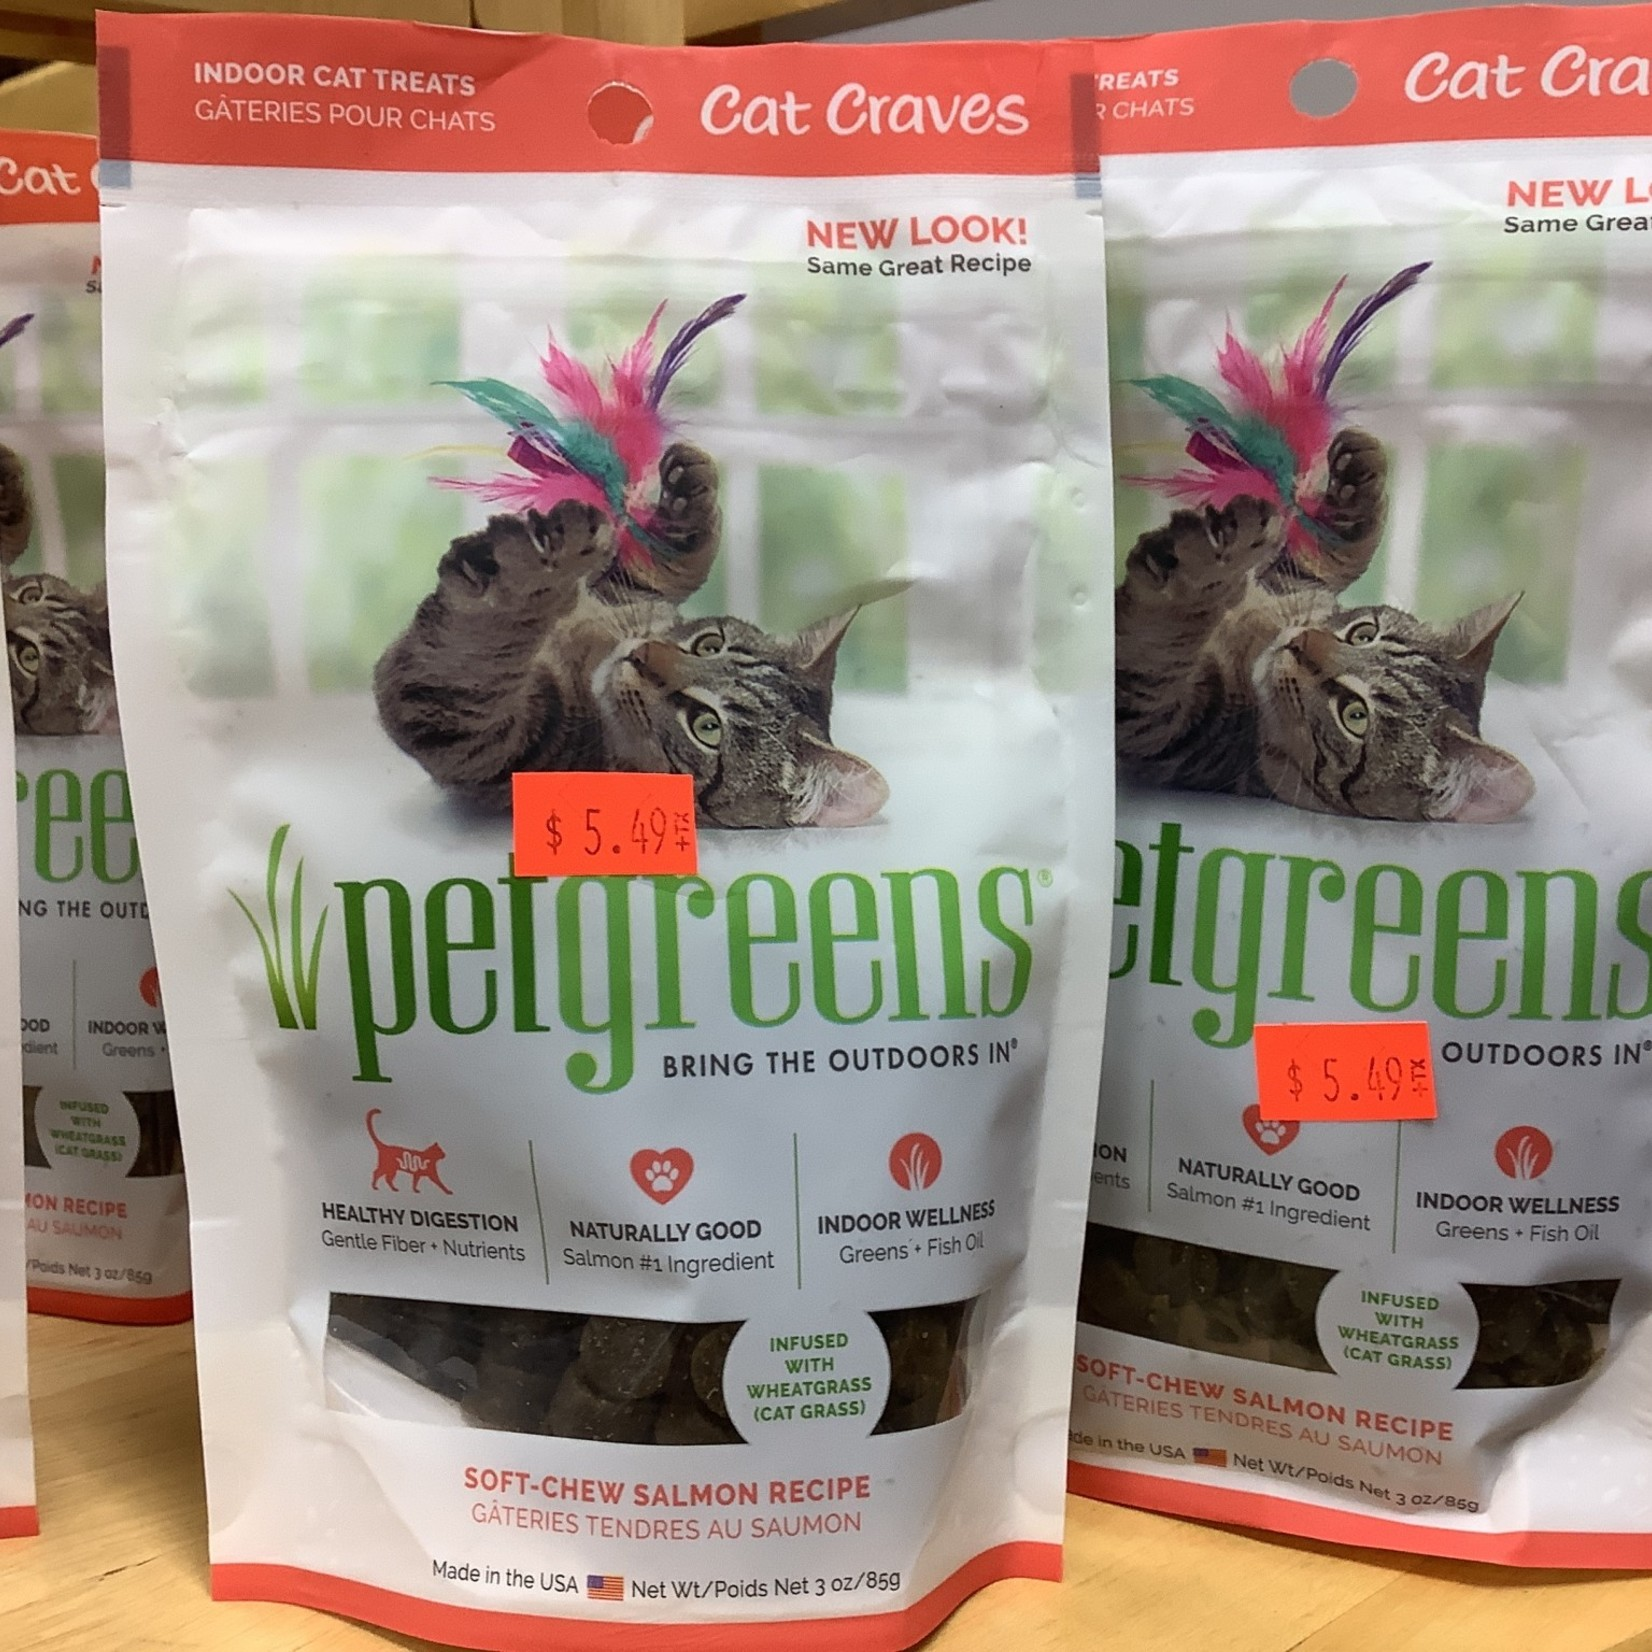 BellRock Soft-Chew Salmon - Cat PetGreens Treats